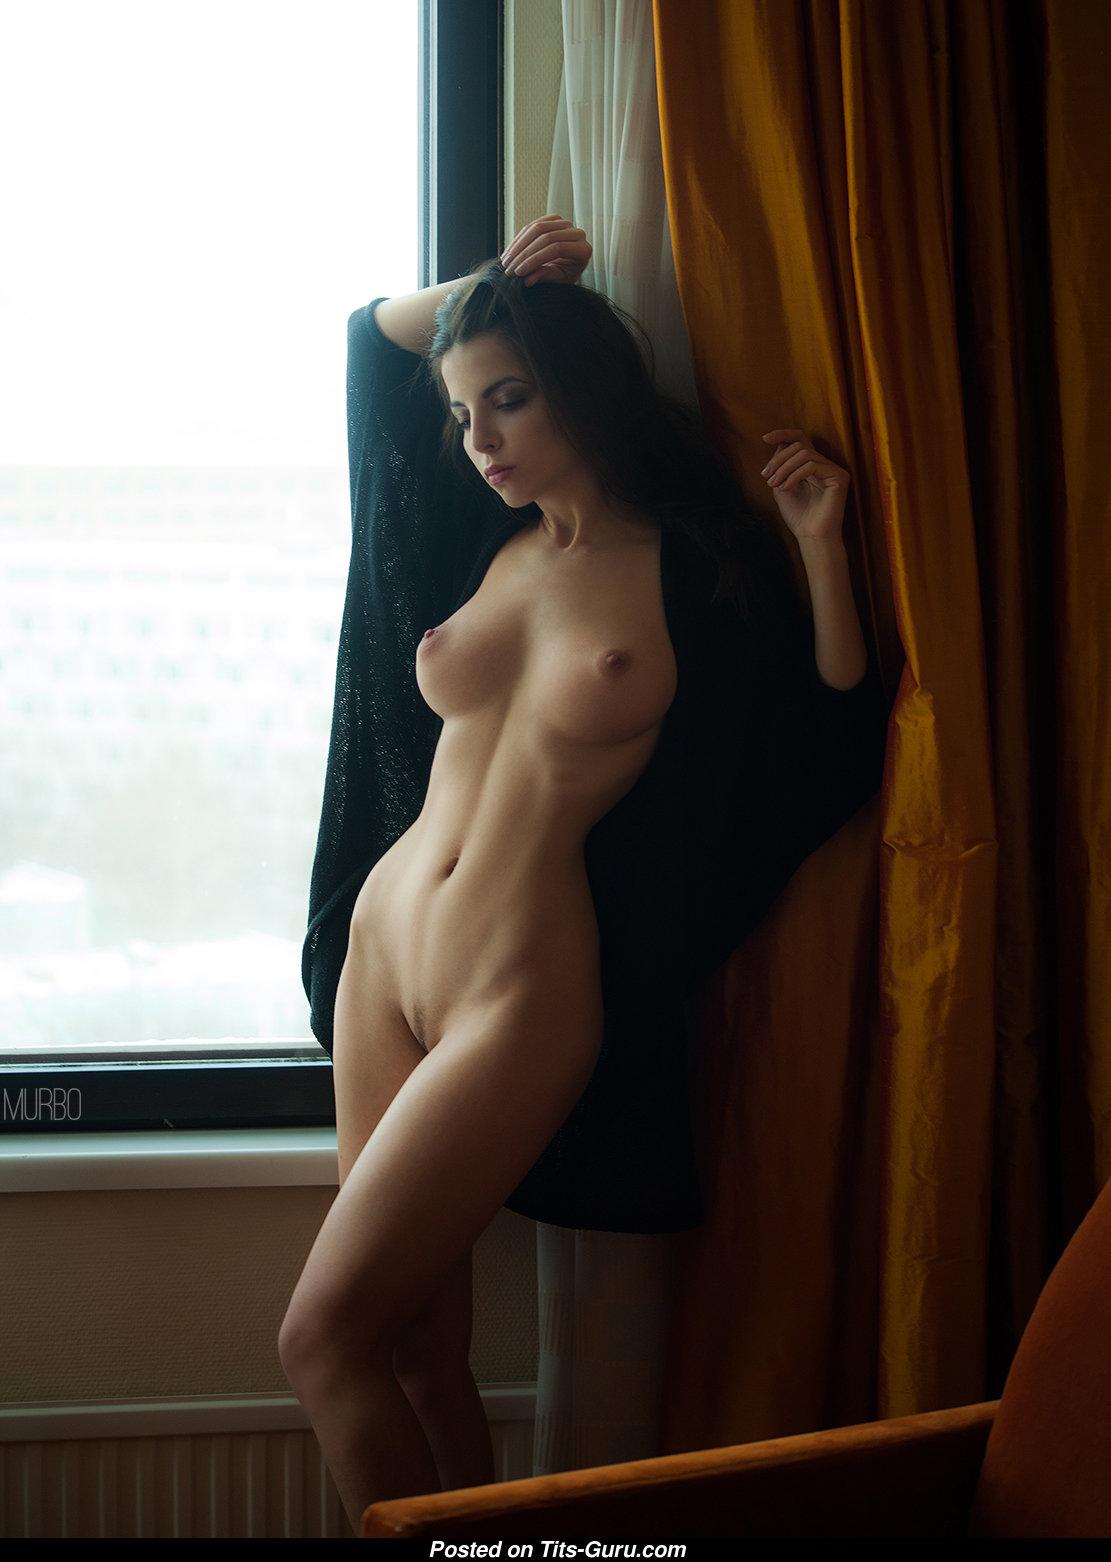 XXX Karina Avakyan nudes (54 photo), Ass, Leaked, Instagram, butt 2019